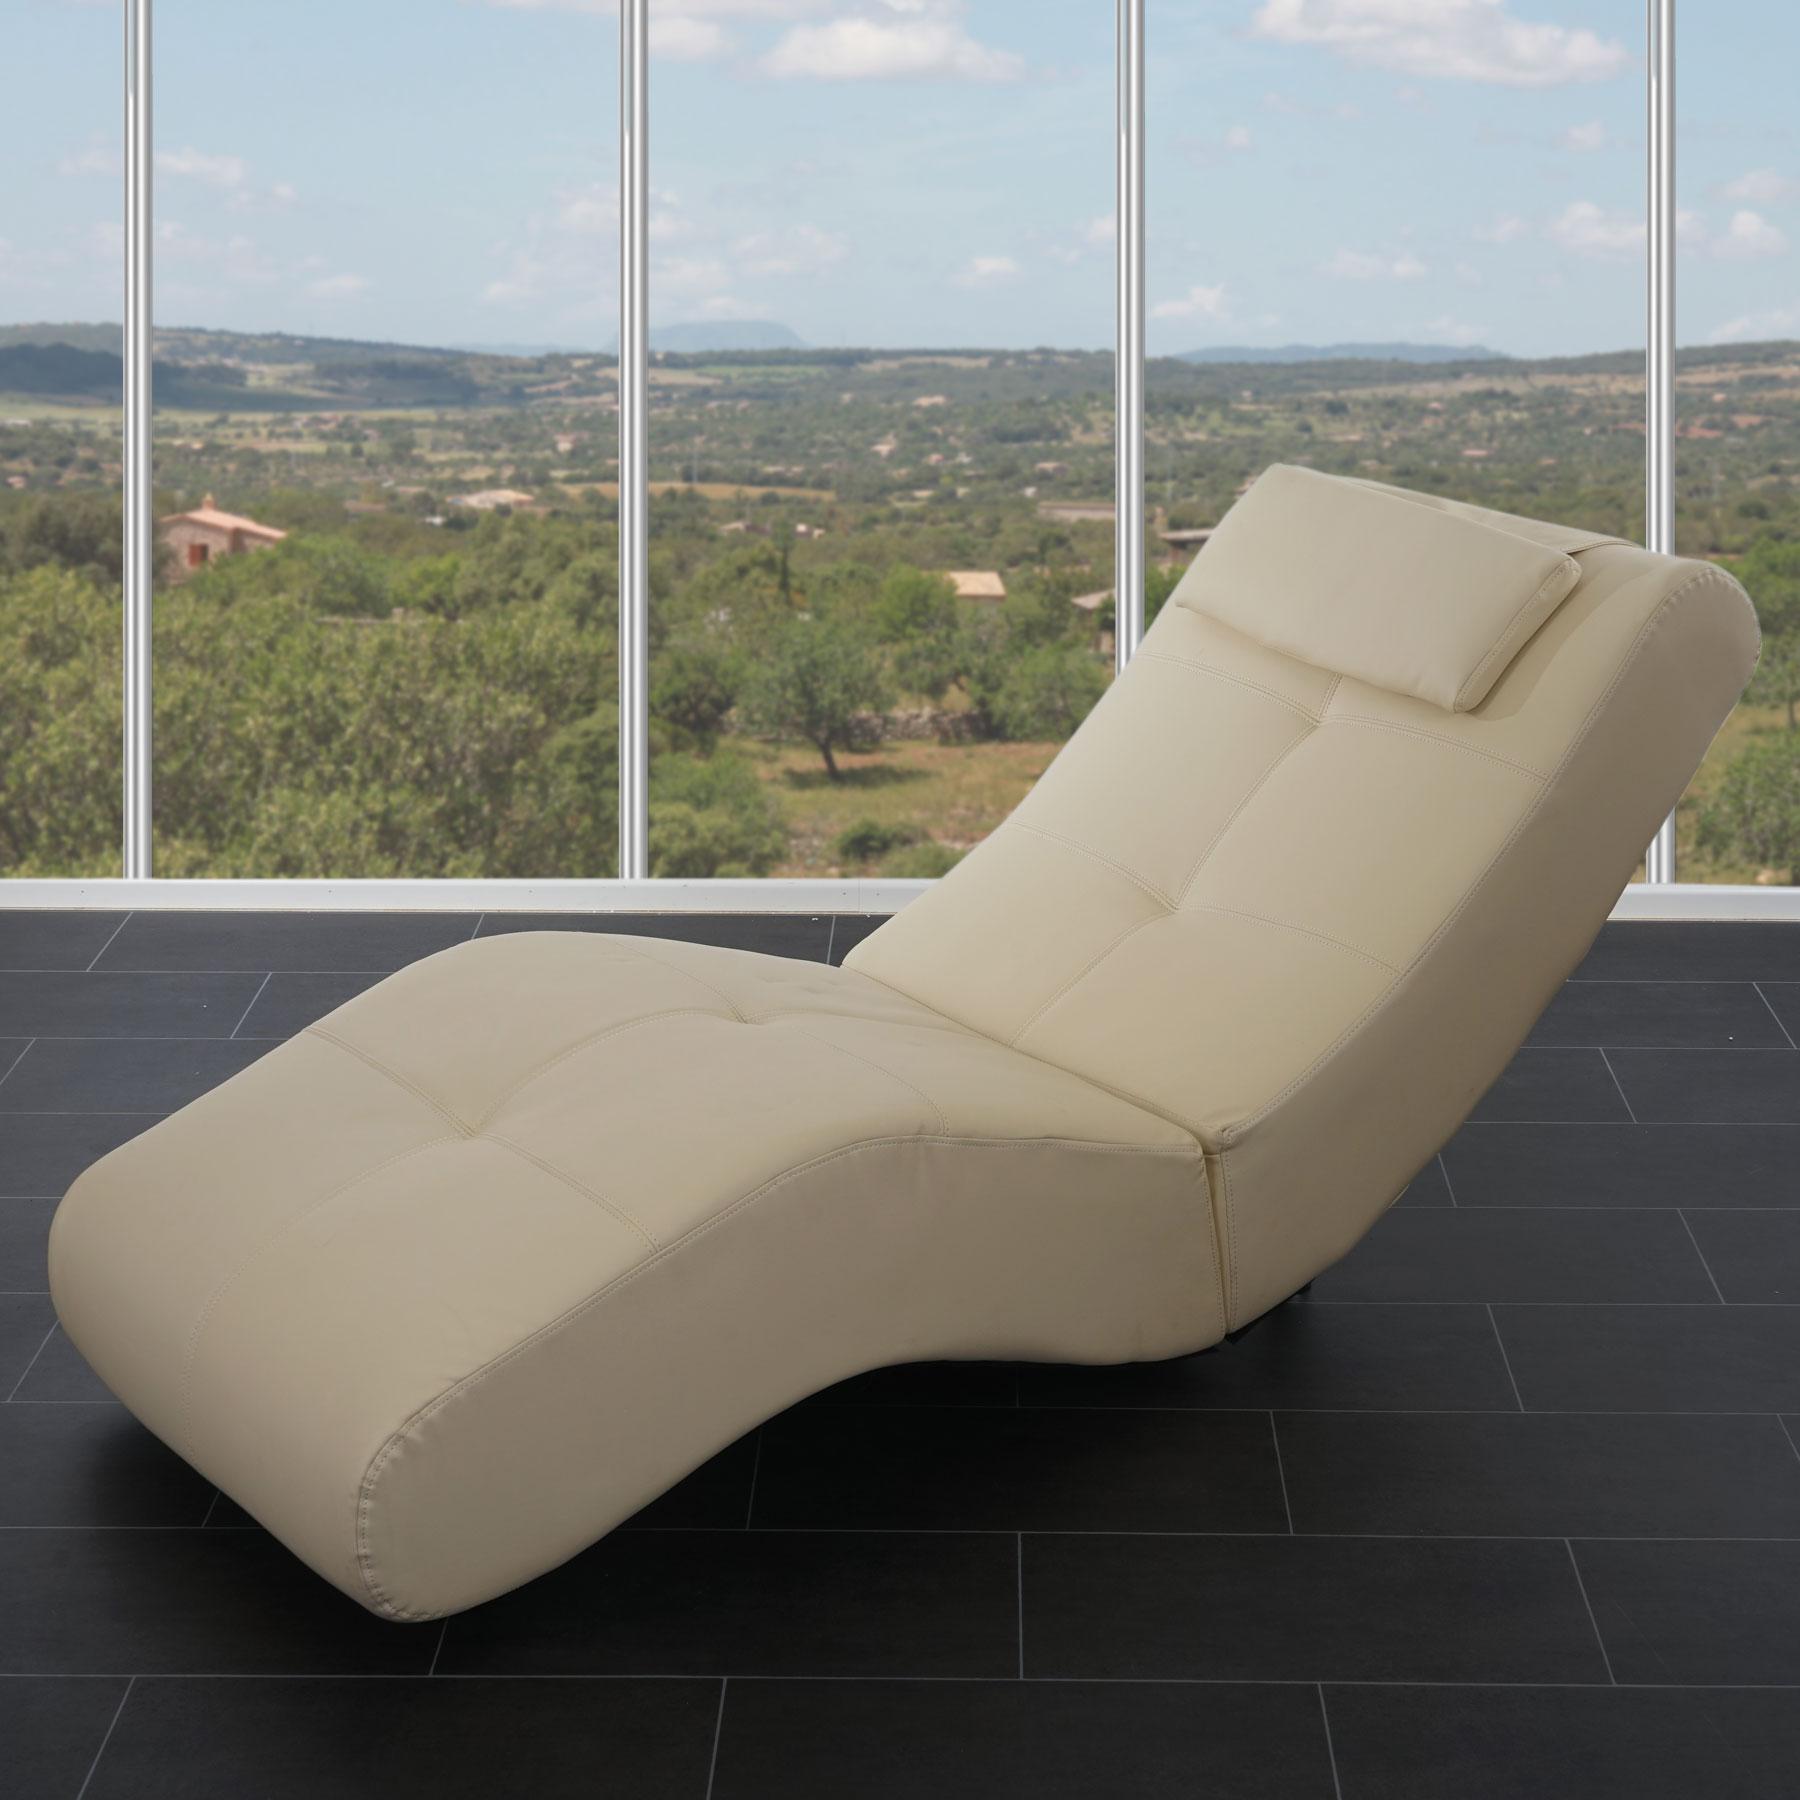 Design chaiselounge poltrona relax livorno ii ecopelle for Poltrona relax design